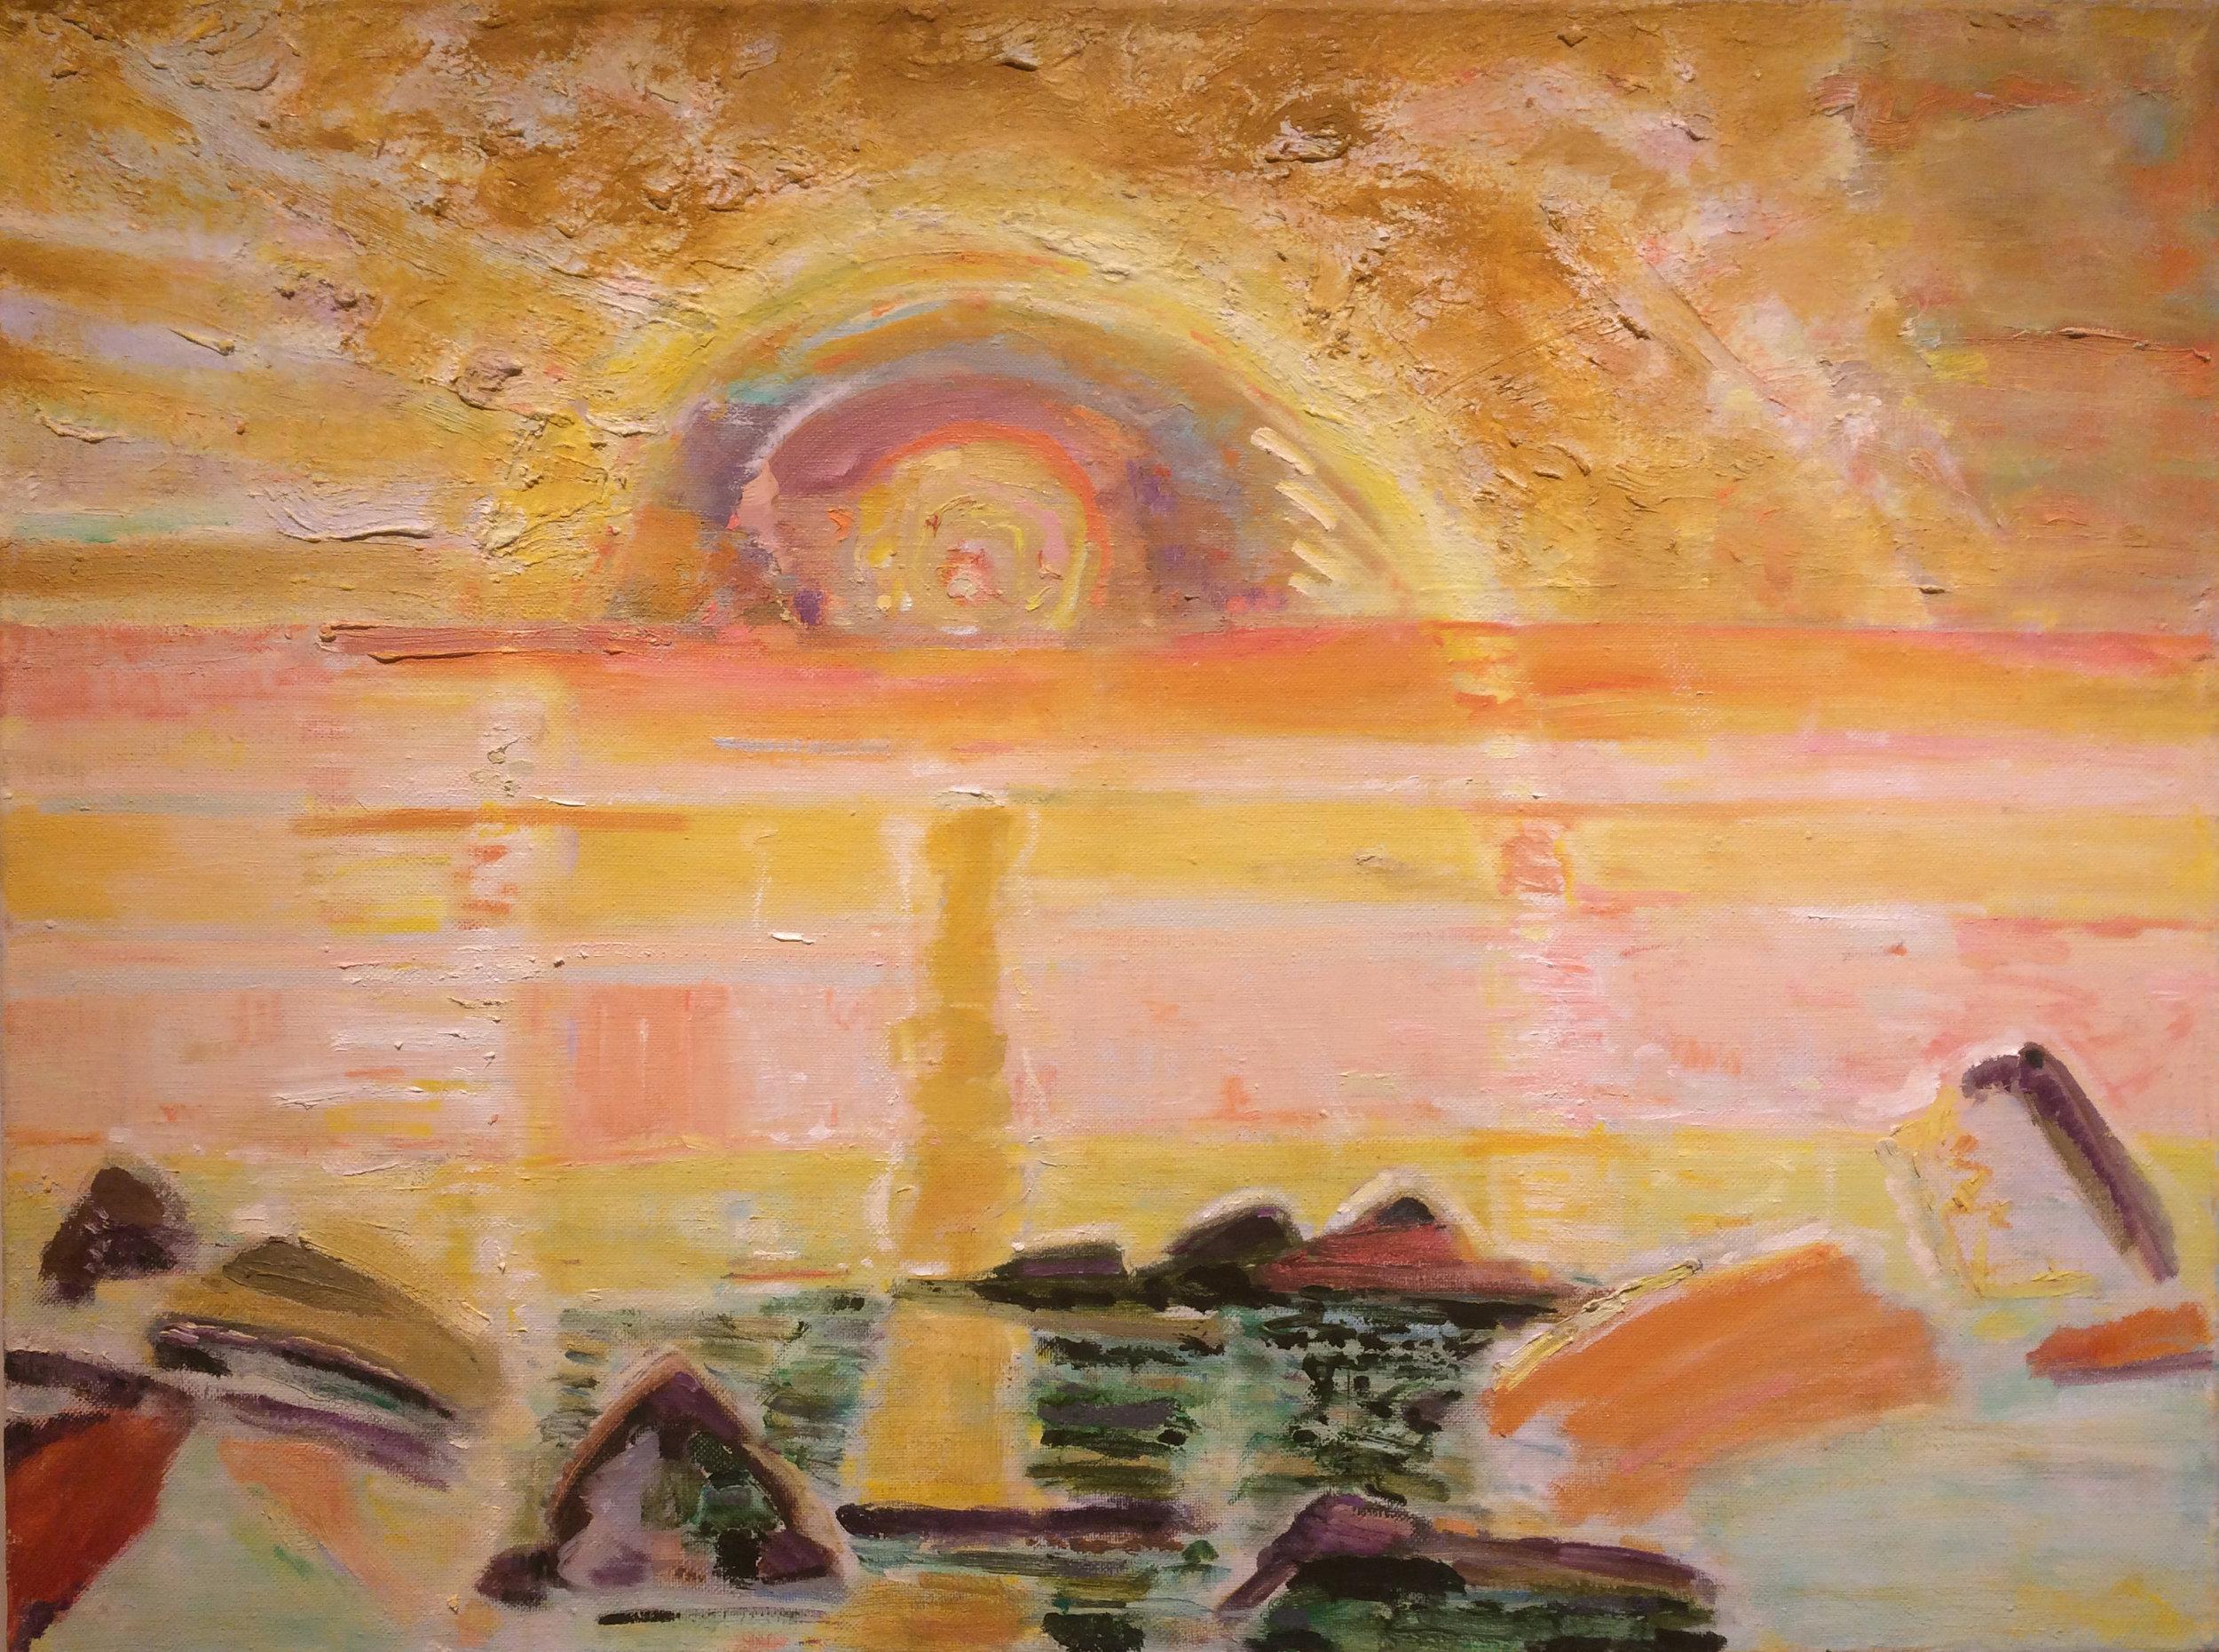 Sun, 1997-98 oil on canvas, 30 x 40 inches